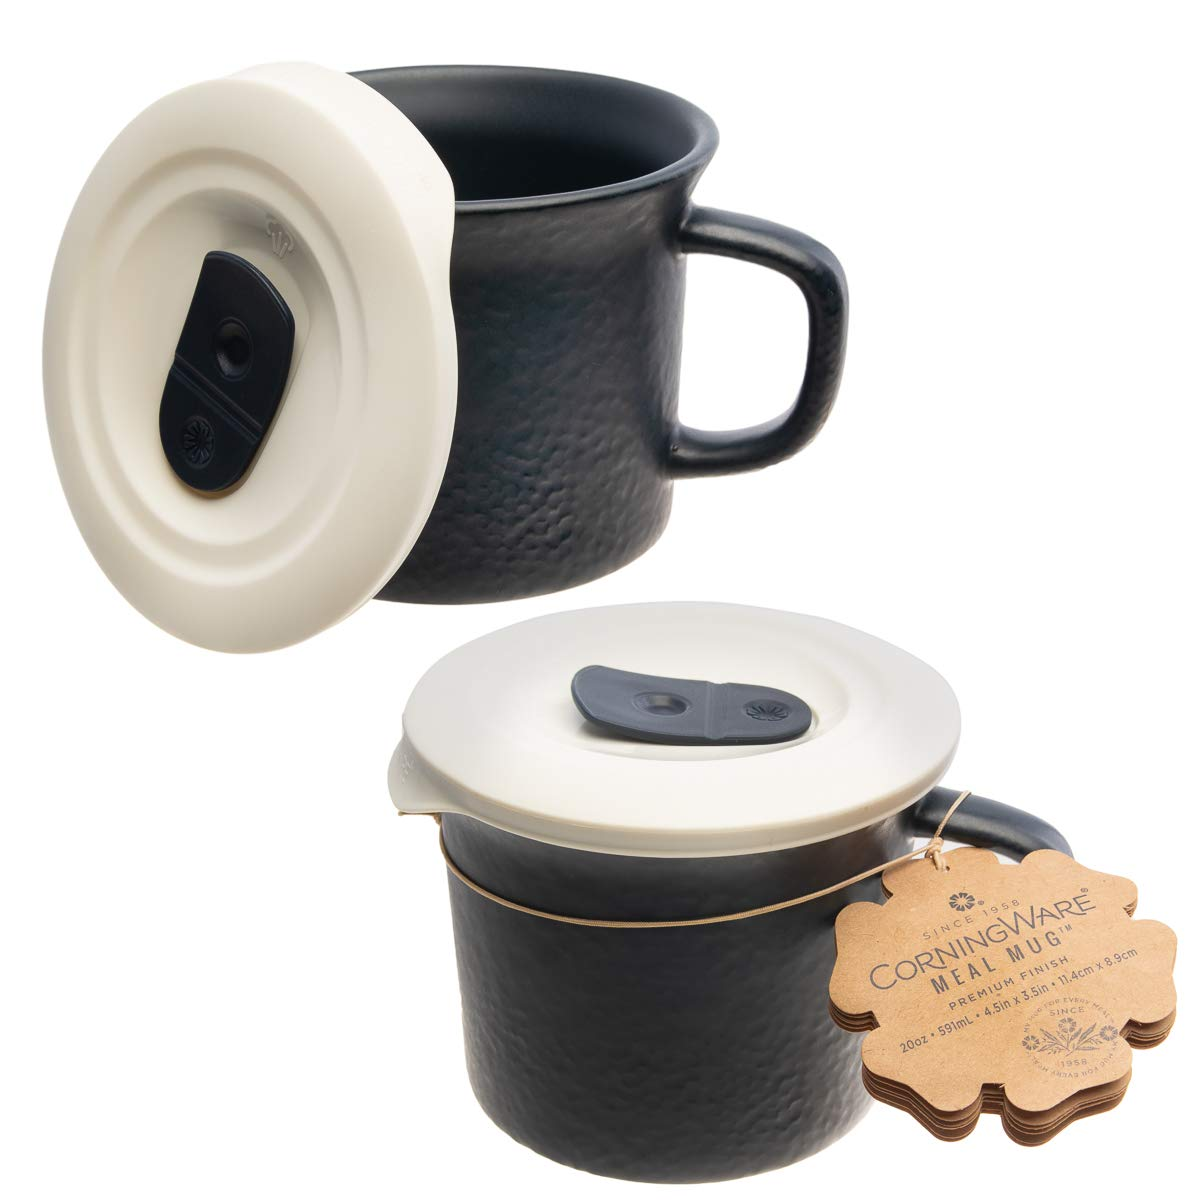 CorningWare (2 Pack 20oz Soup Mug with Lid Coffee Travel Mug Camping Accessories Kitchen Mugs Set